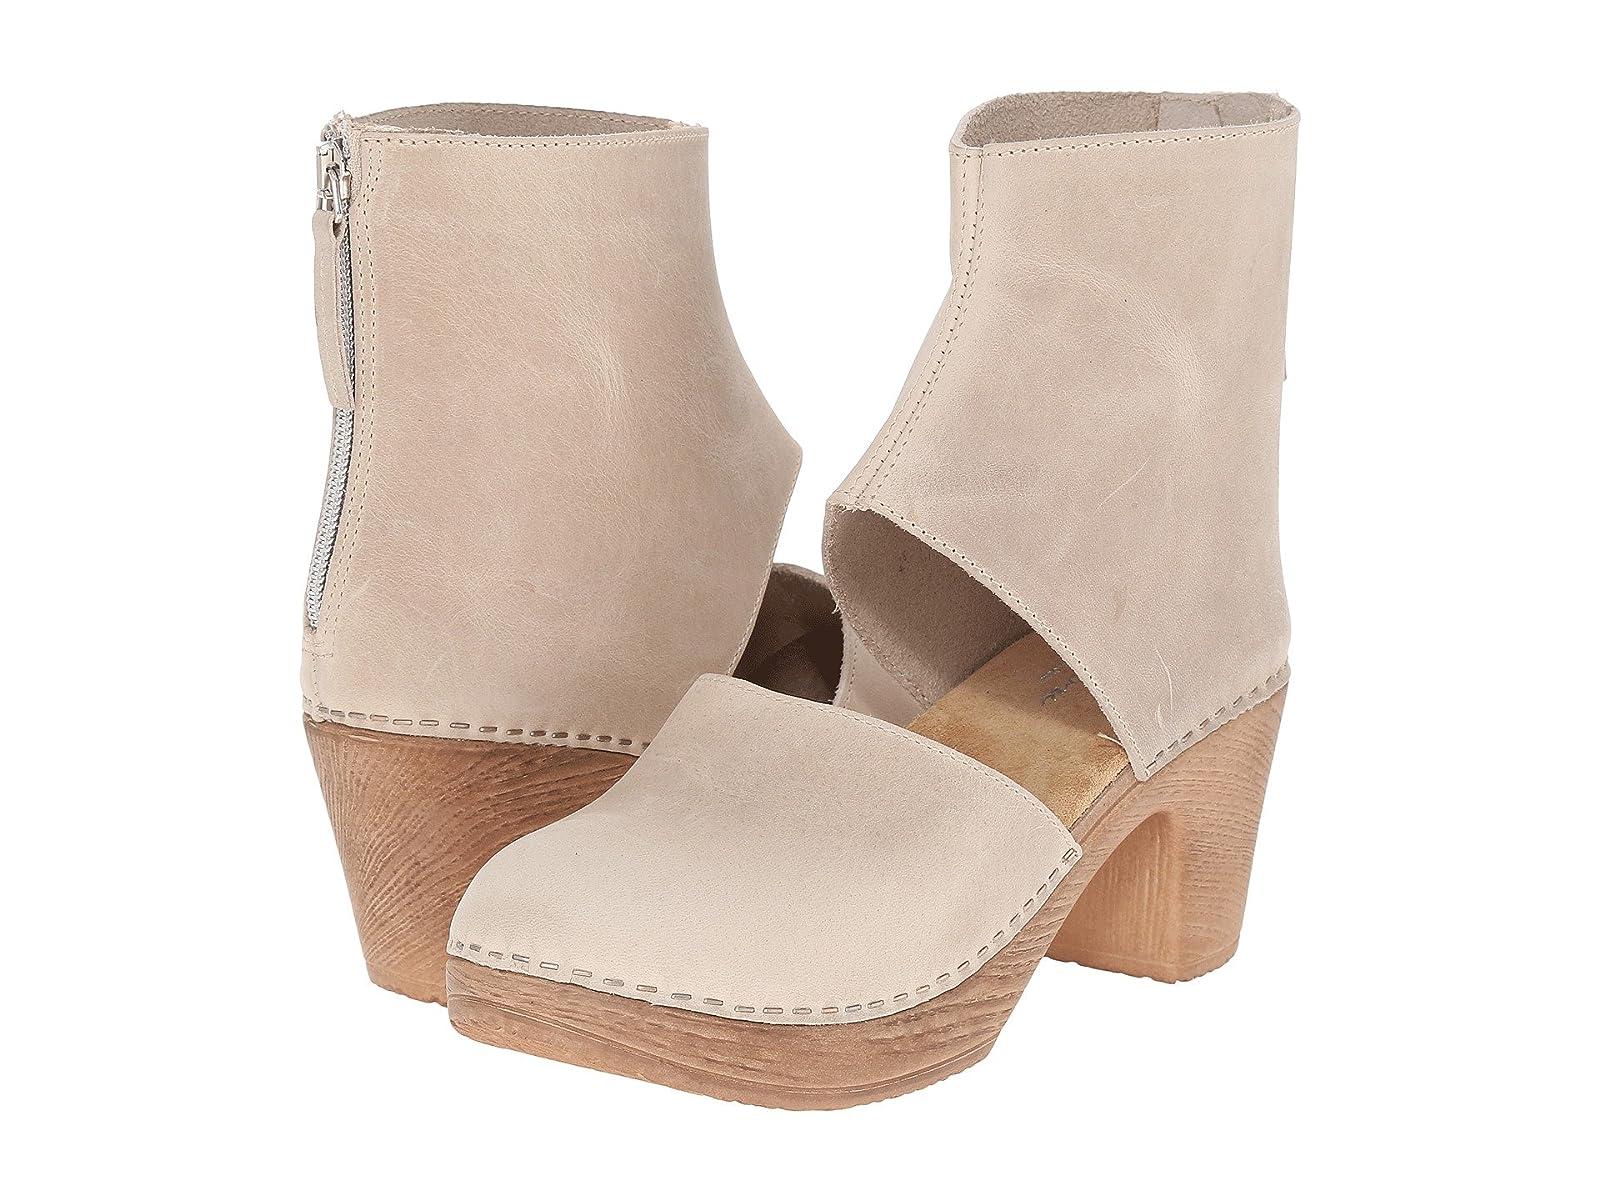 Calou Stockholm MejaCheap and distinctive eye-catching shoes